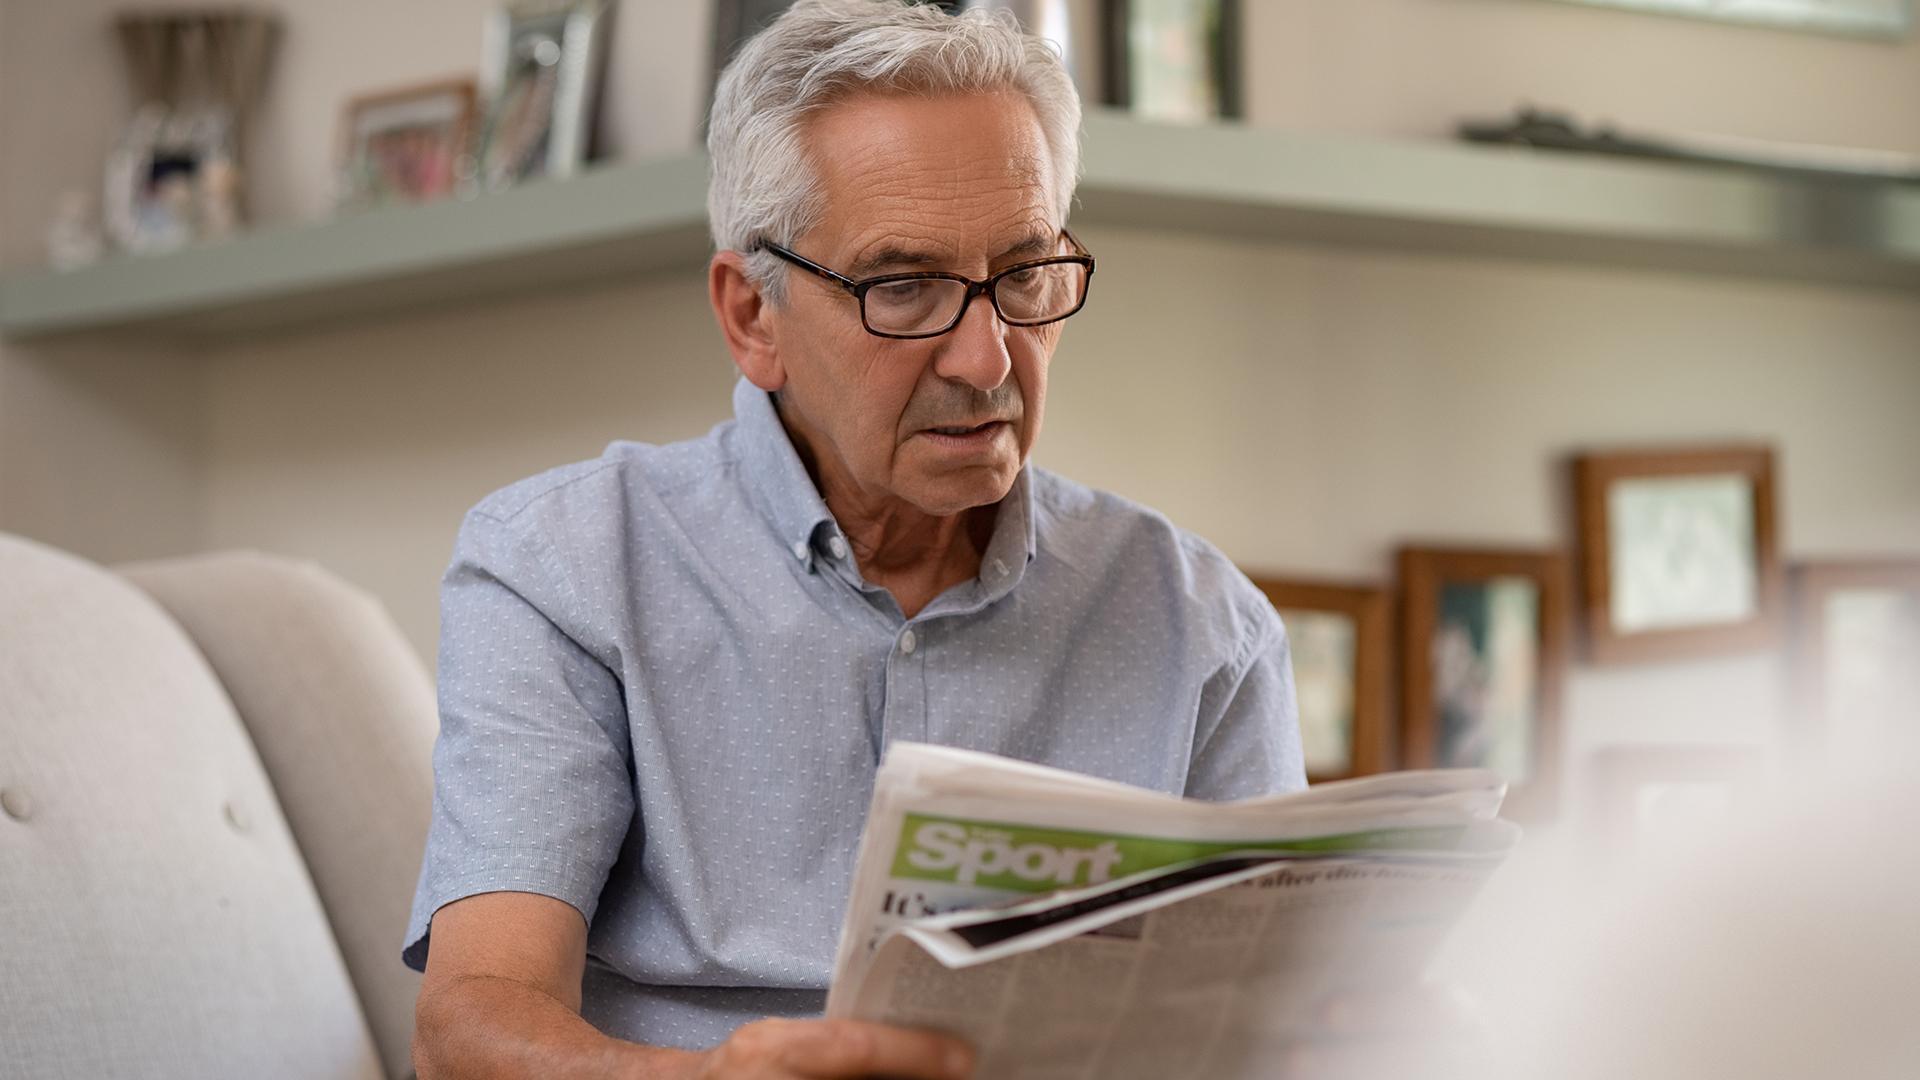 Билингвизм и старение мозга